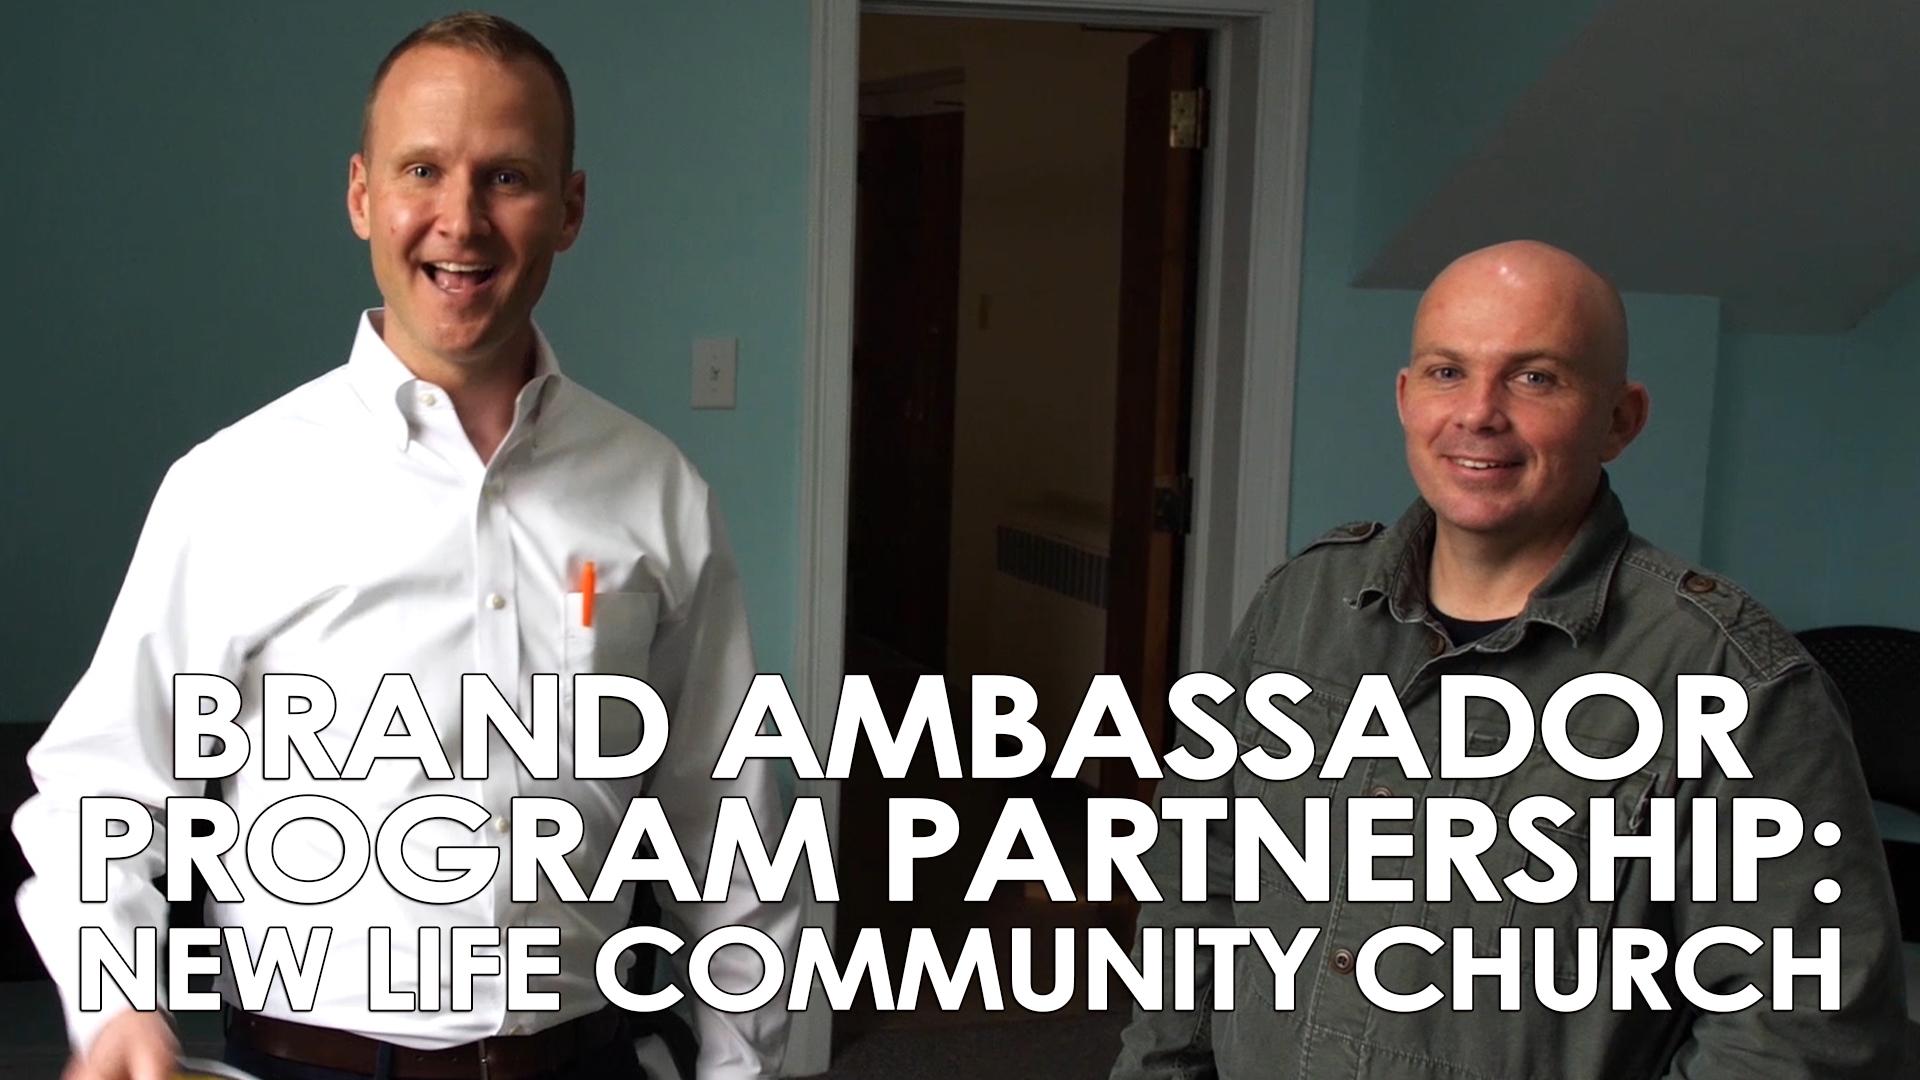 Shining the Spotlight on New Life Community Church